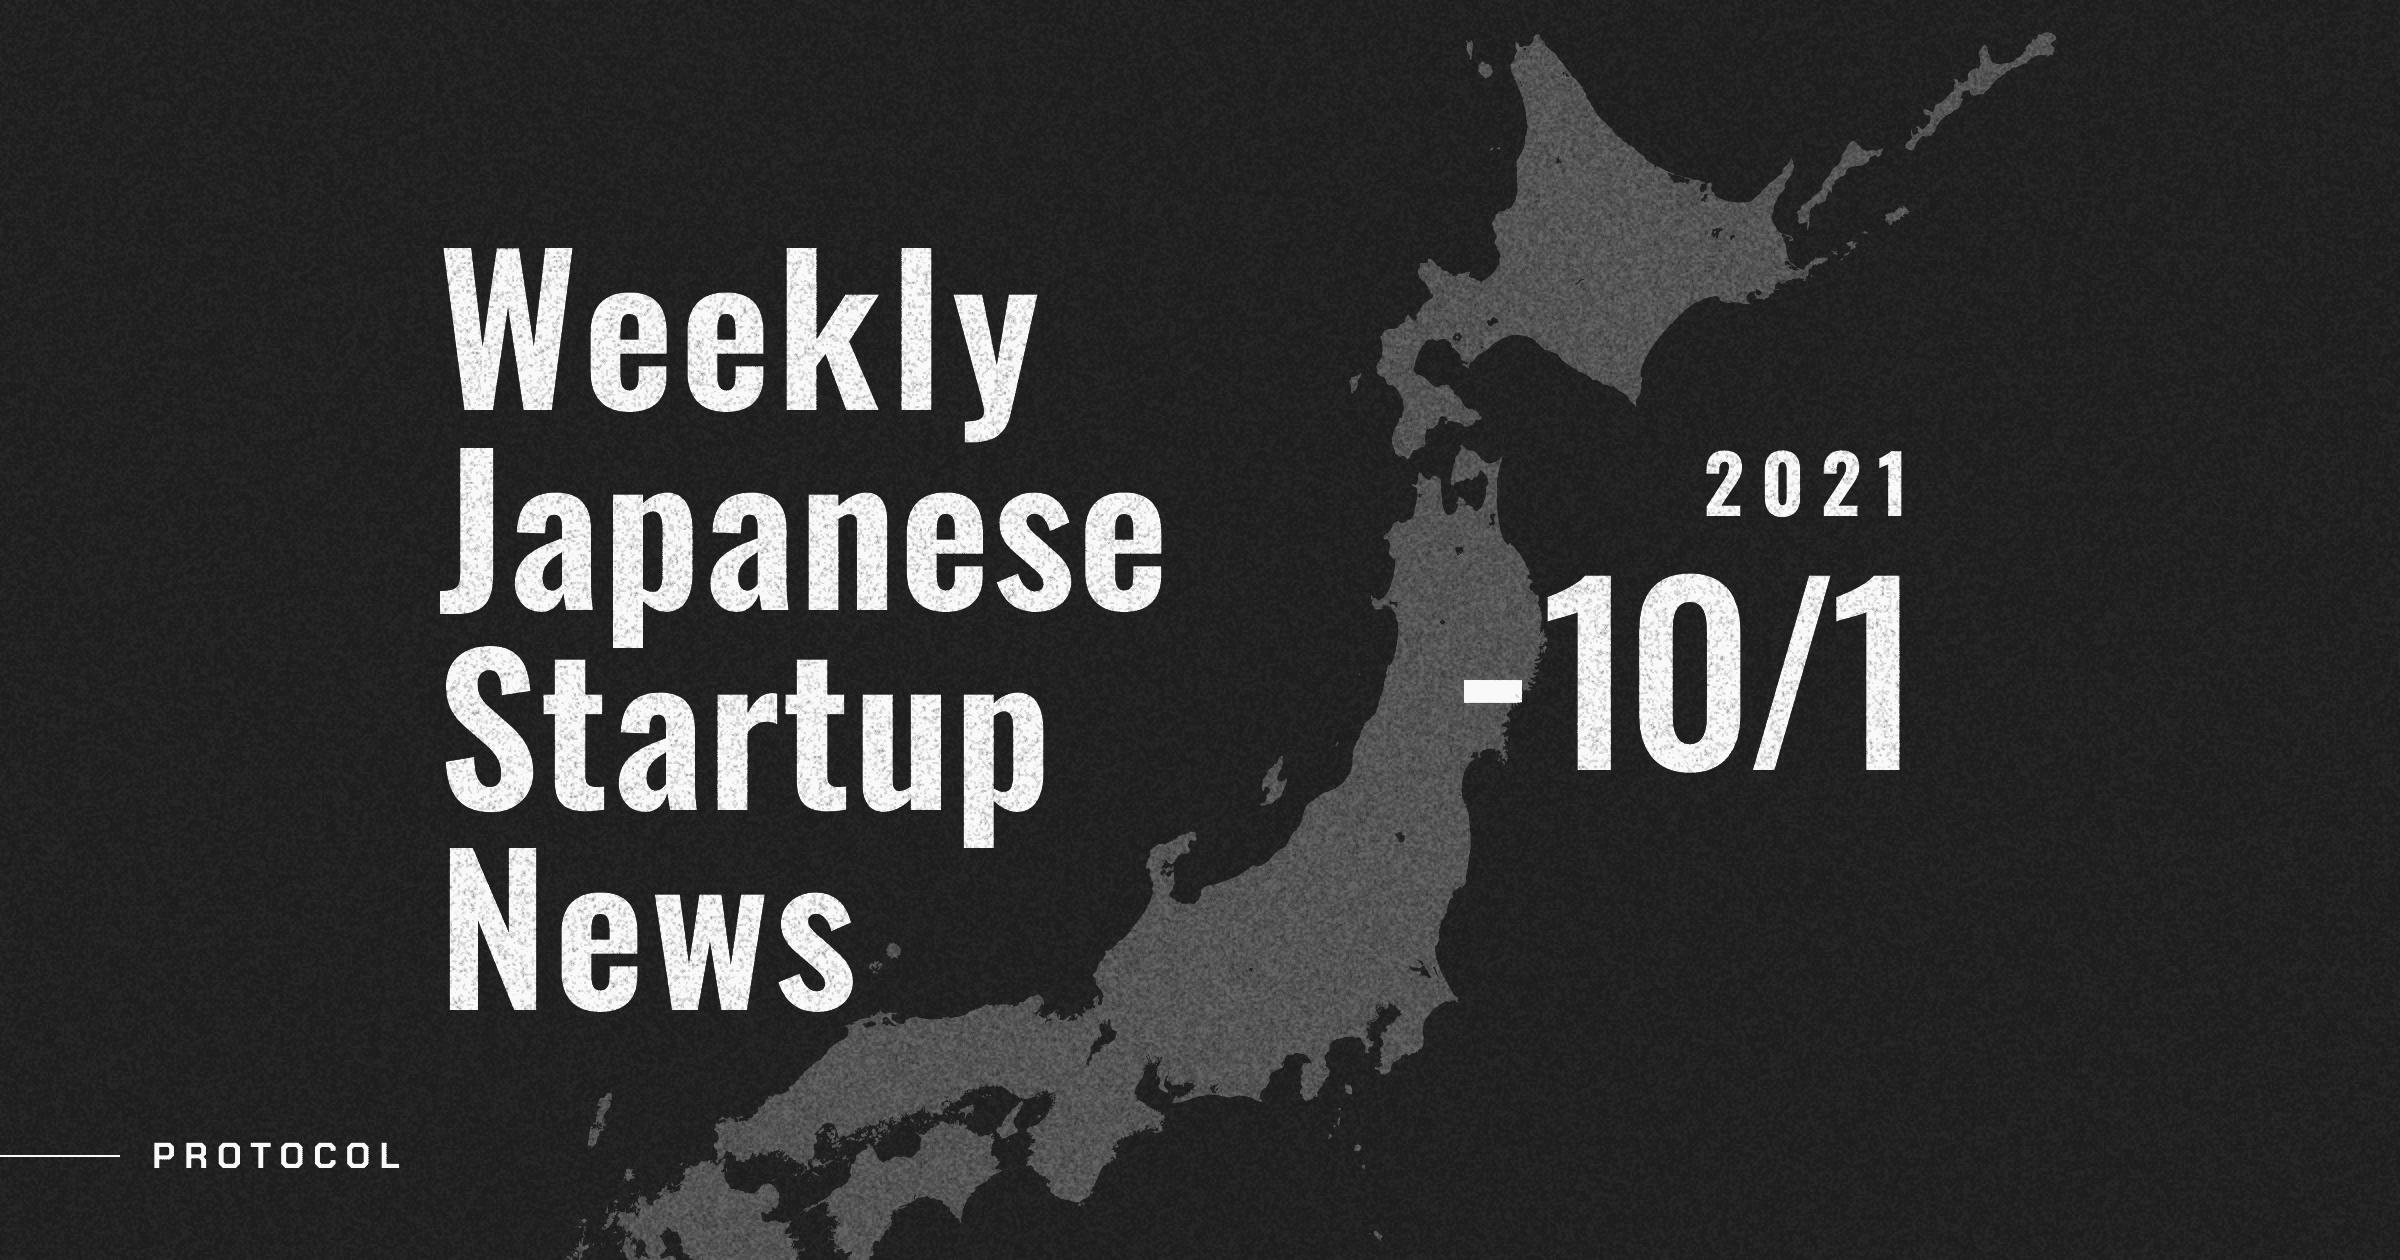 Weekly Japanese Startup News - 10/1/2021